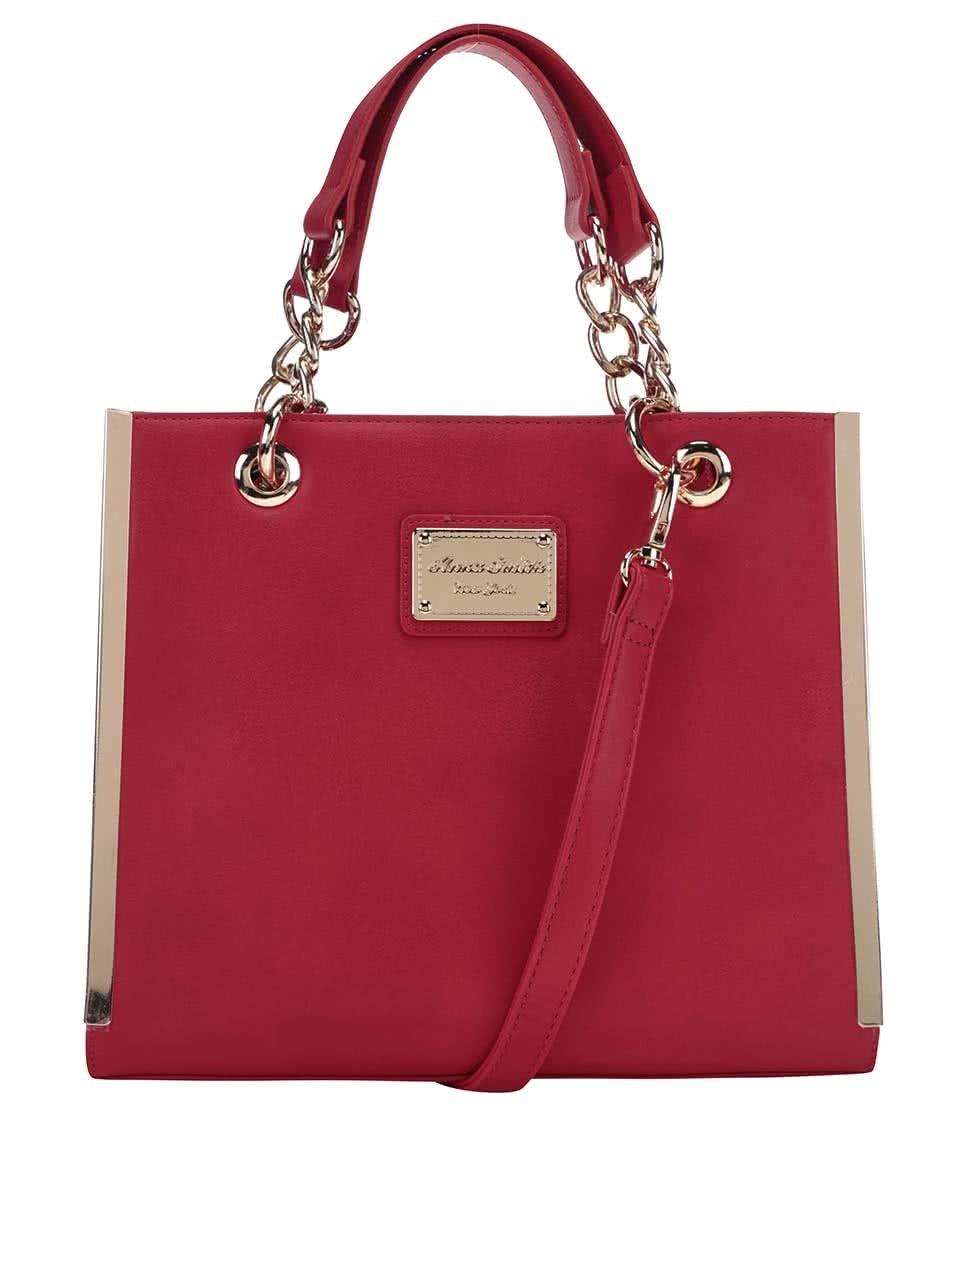 Červená čtvercová kabelka Anna Smith